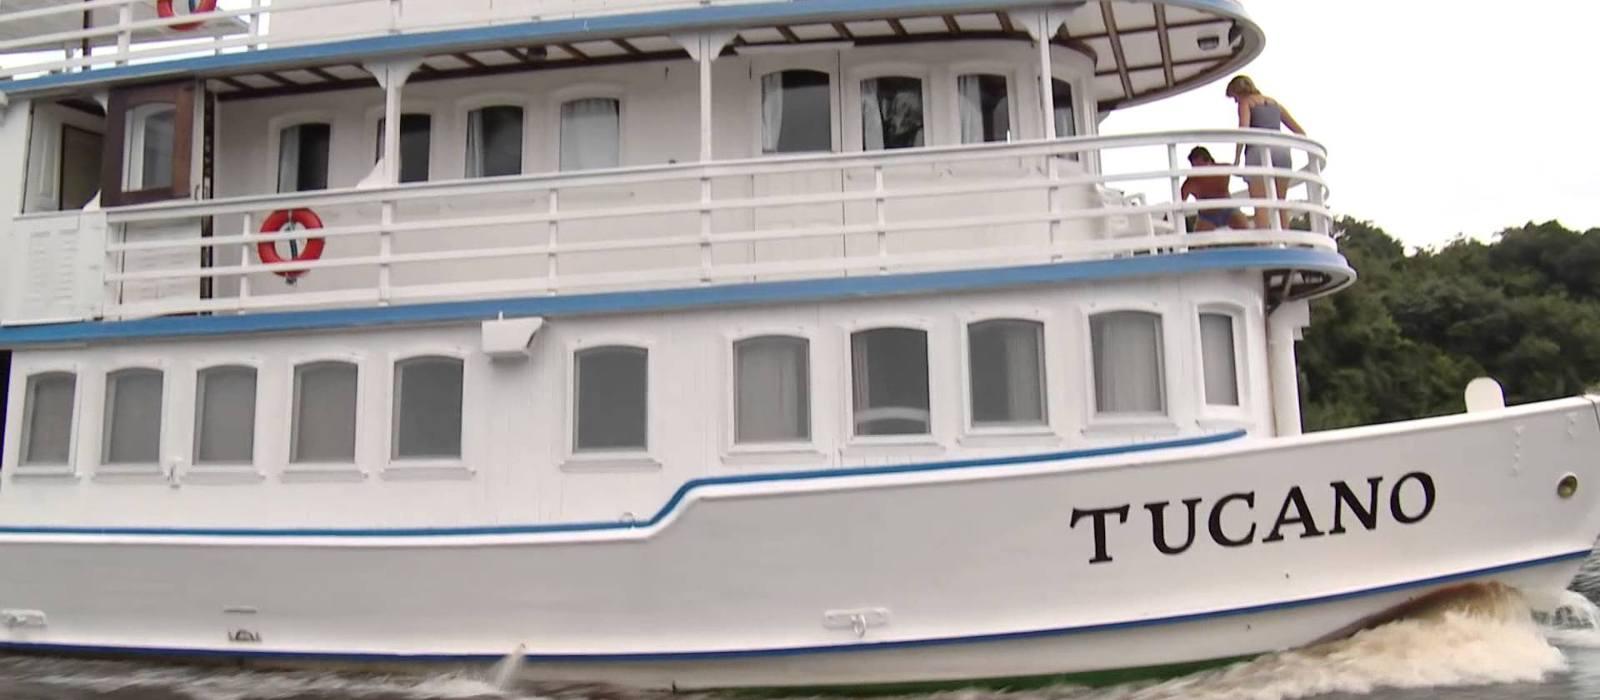 Hotel Motor Yacht Tucano Brasilien